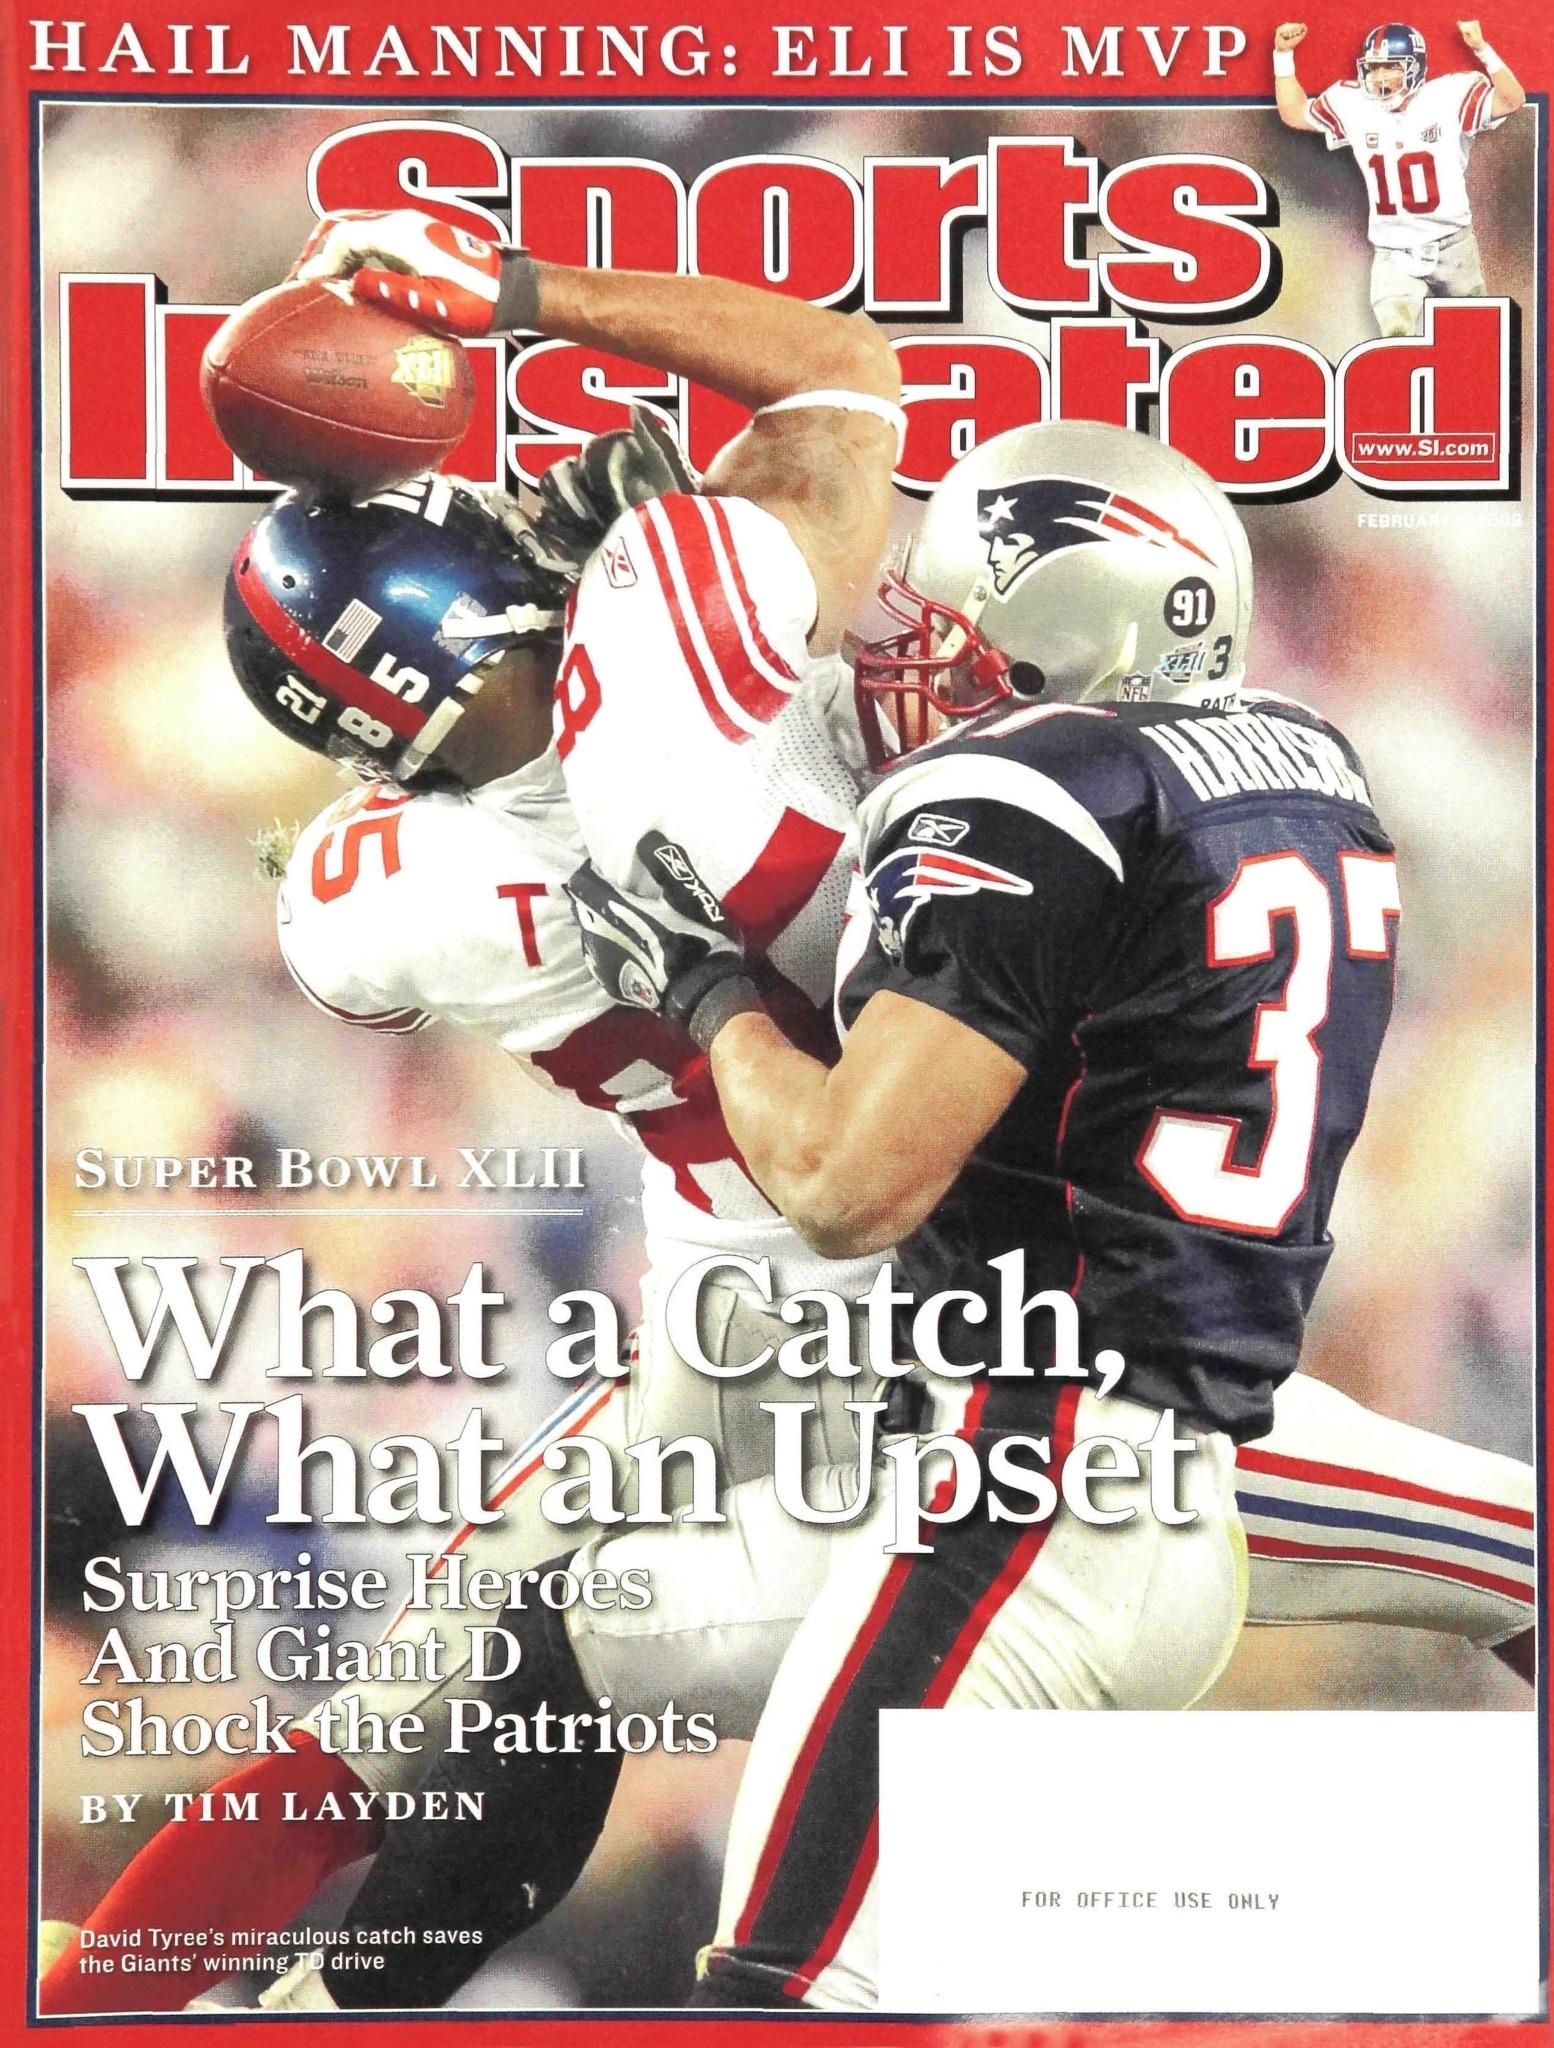 Super Bowl Xlii: Eli Manning, Giants Stun Perfect Patriots with Giants Patriots Super Bowl